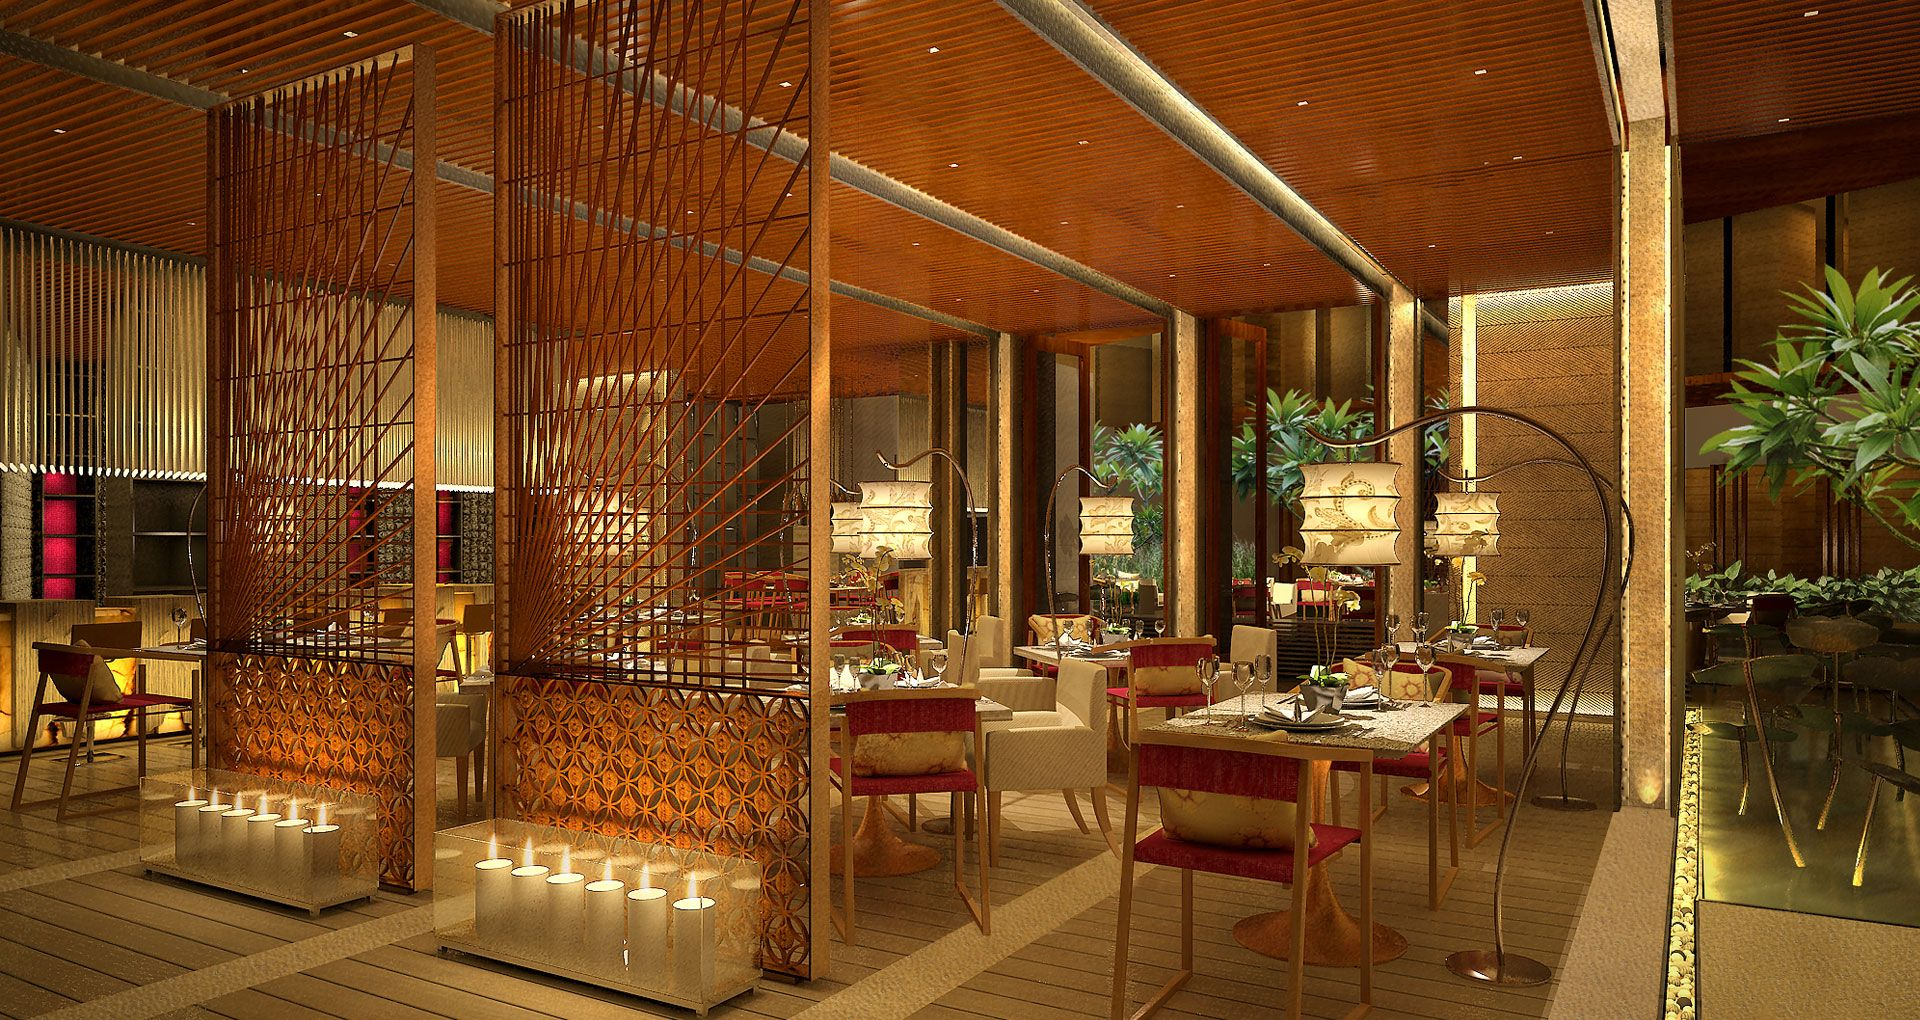 Smart open floors resorts restaurant indian interior for Indian interior design